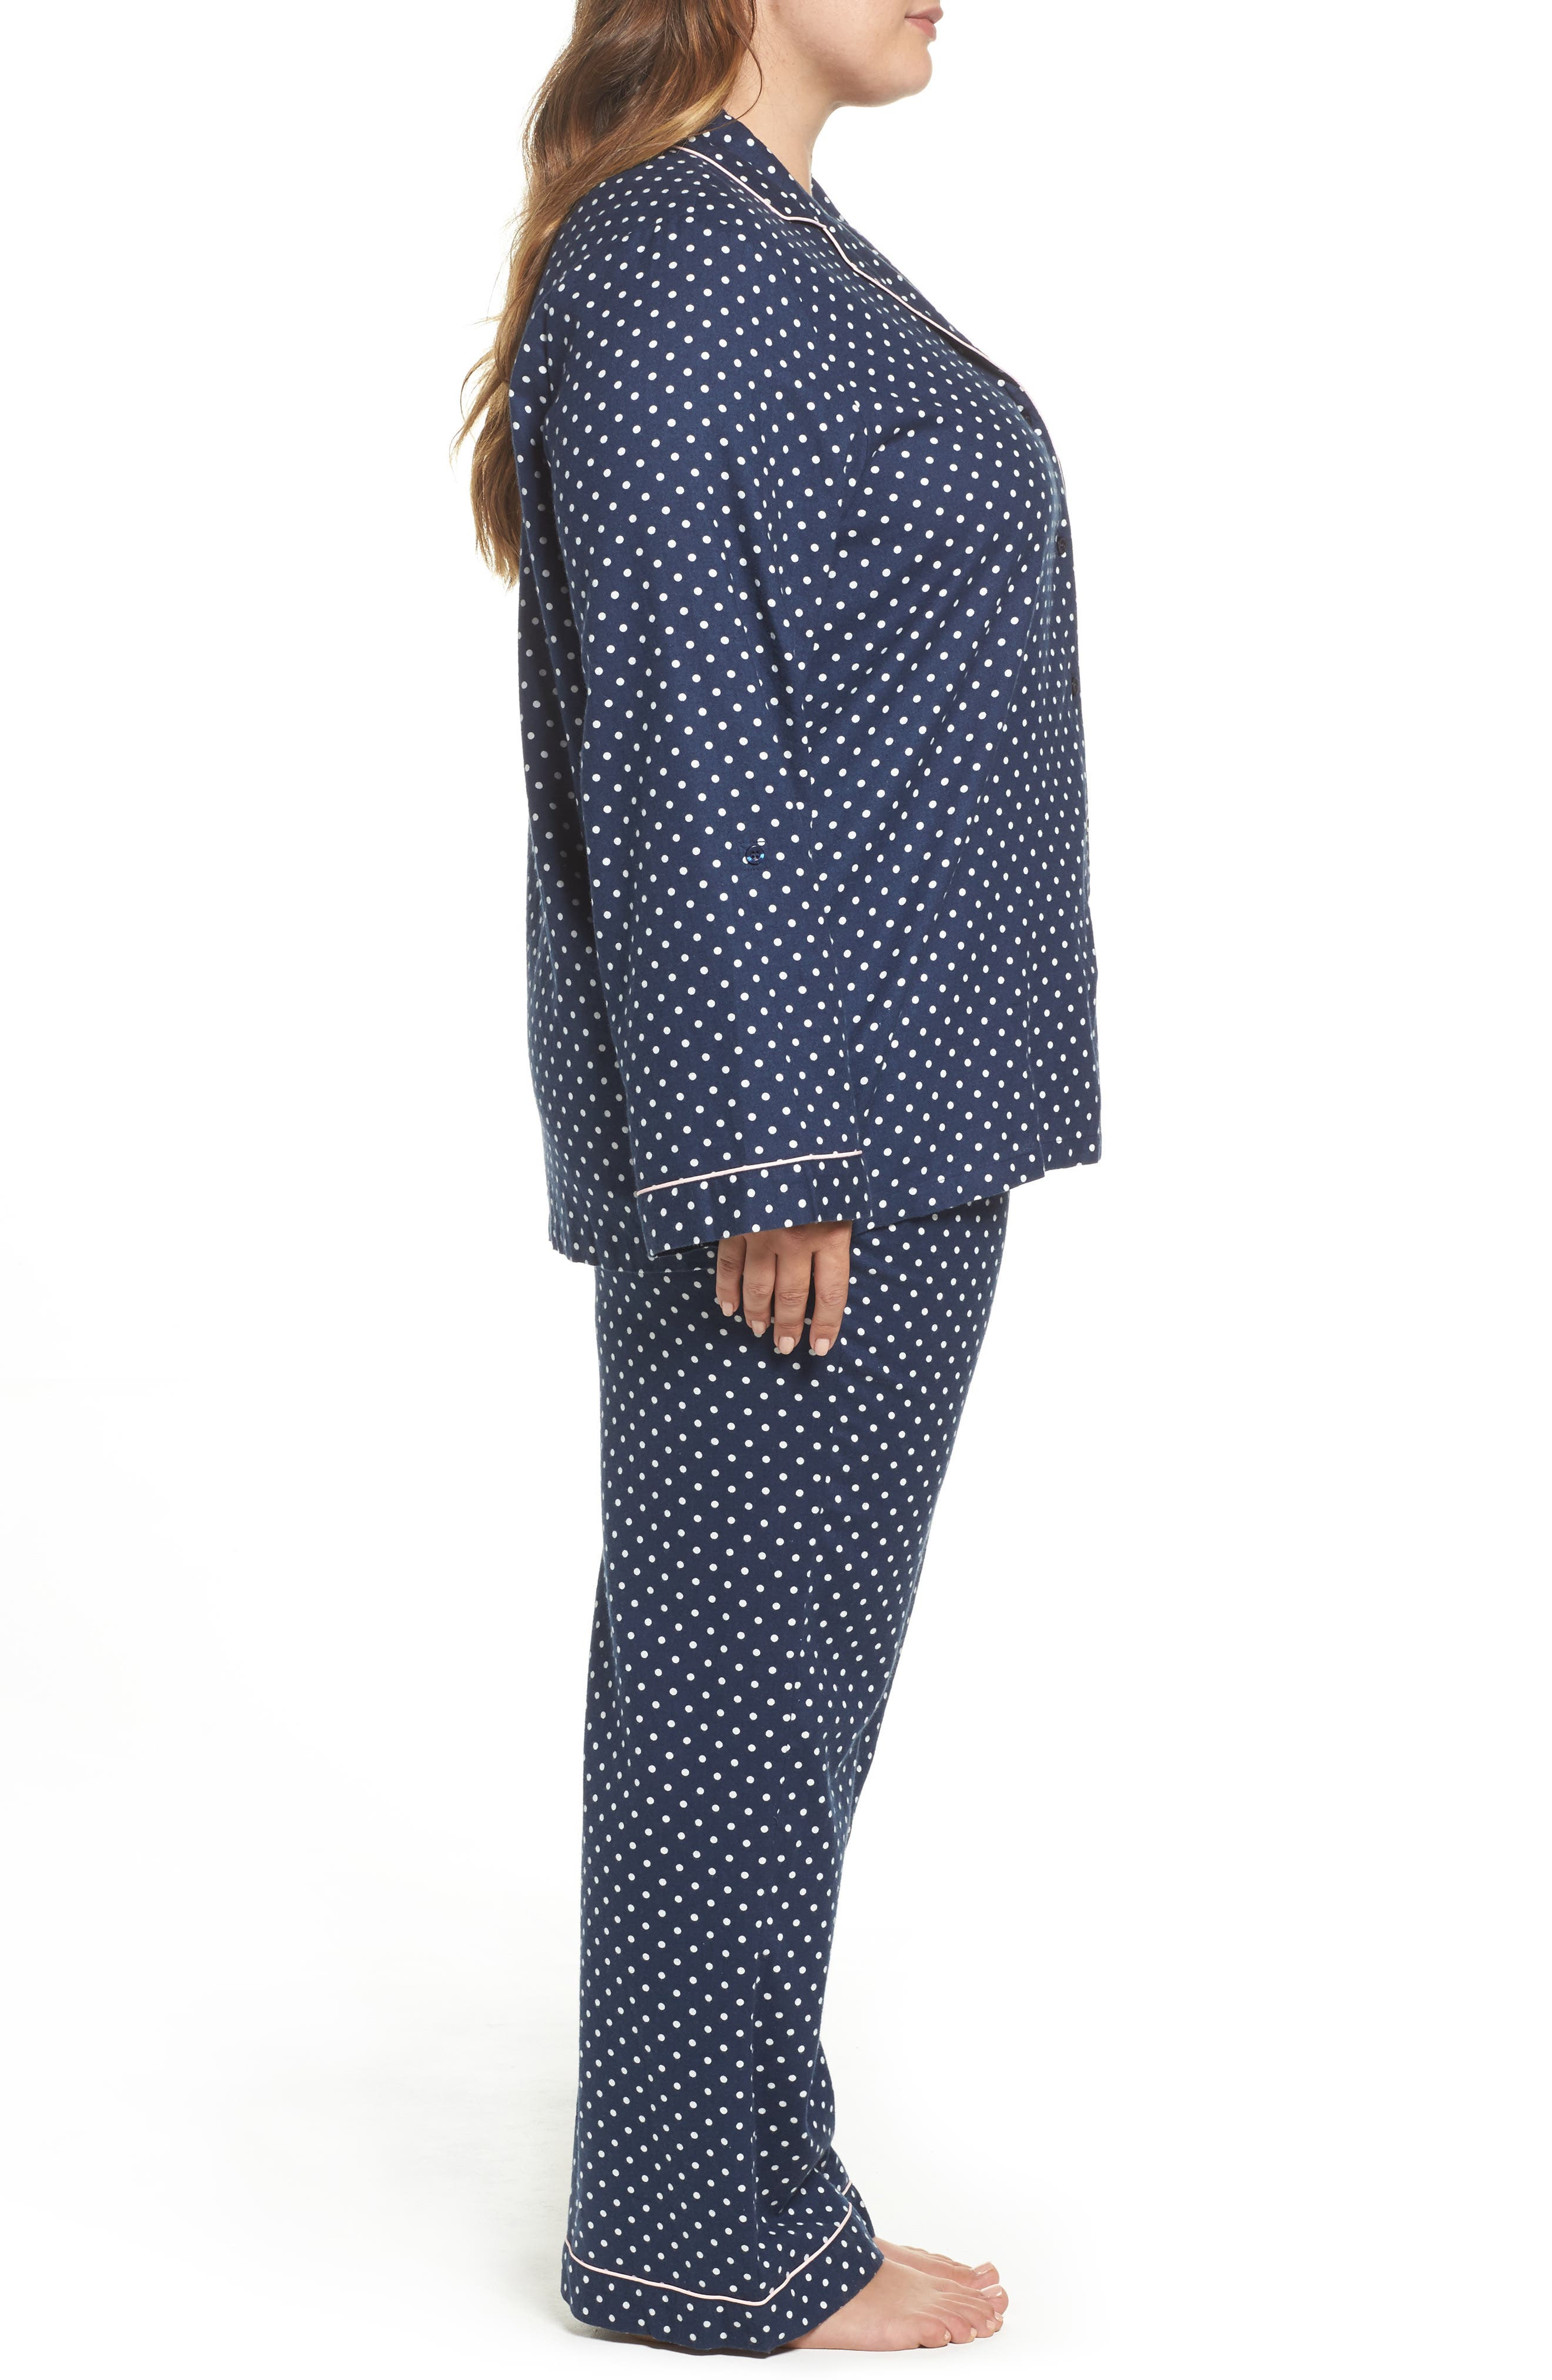 Alternate Image 3  - Nordstrom Lingerie Cotton Twill Pajamas (Plus Size)